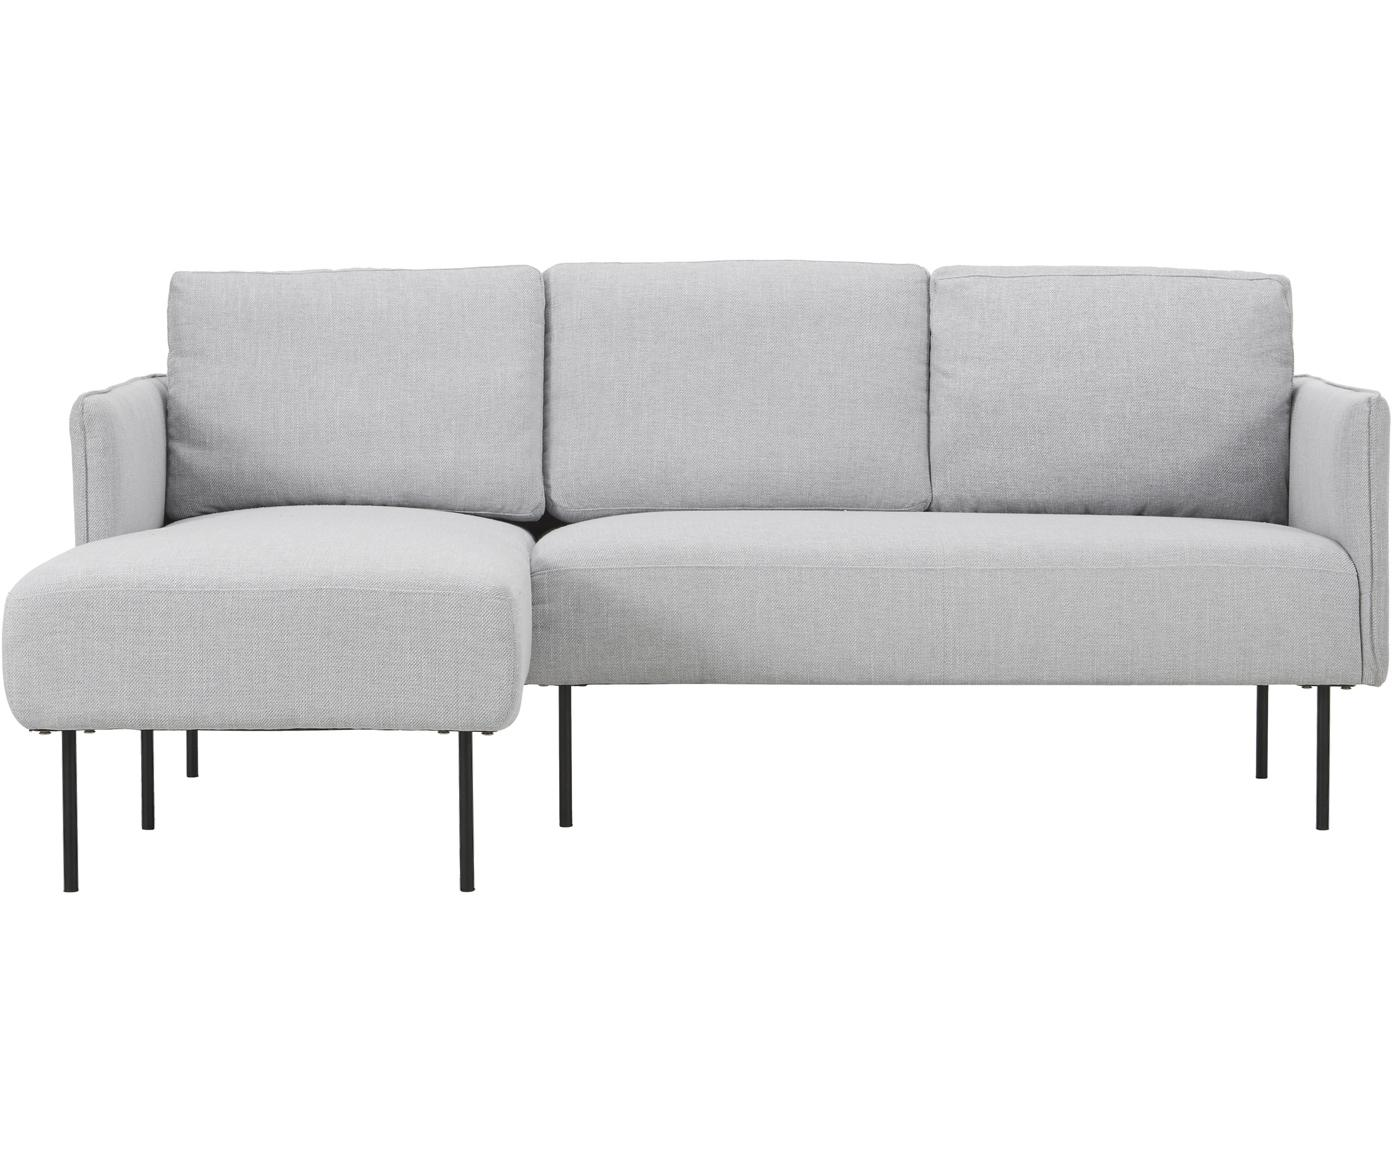 Ecksofa Ramira, Bezug: Polyester 40.000 Scheuert, Gestell: Massives Kiefernholz, Spe, Webstoff Hellgrau, B 192 x T 136 cm